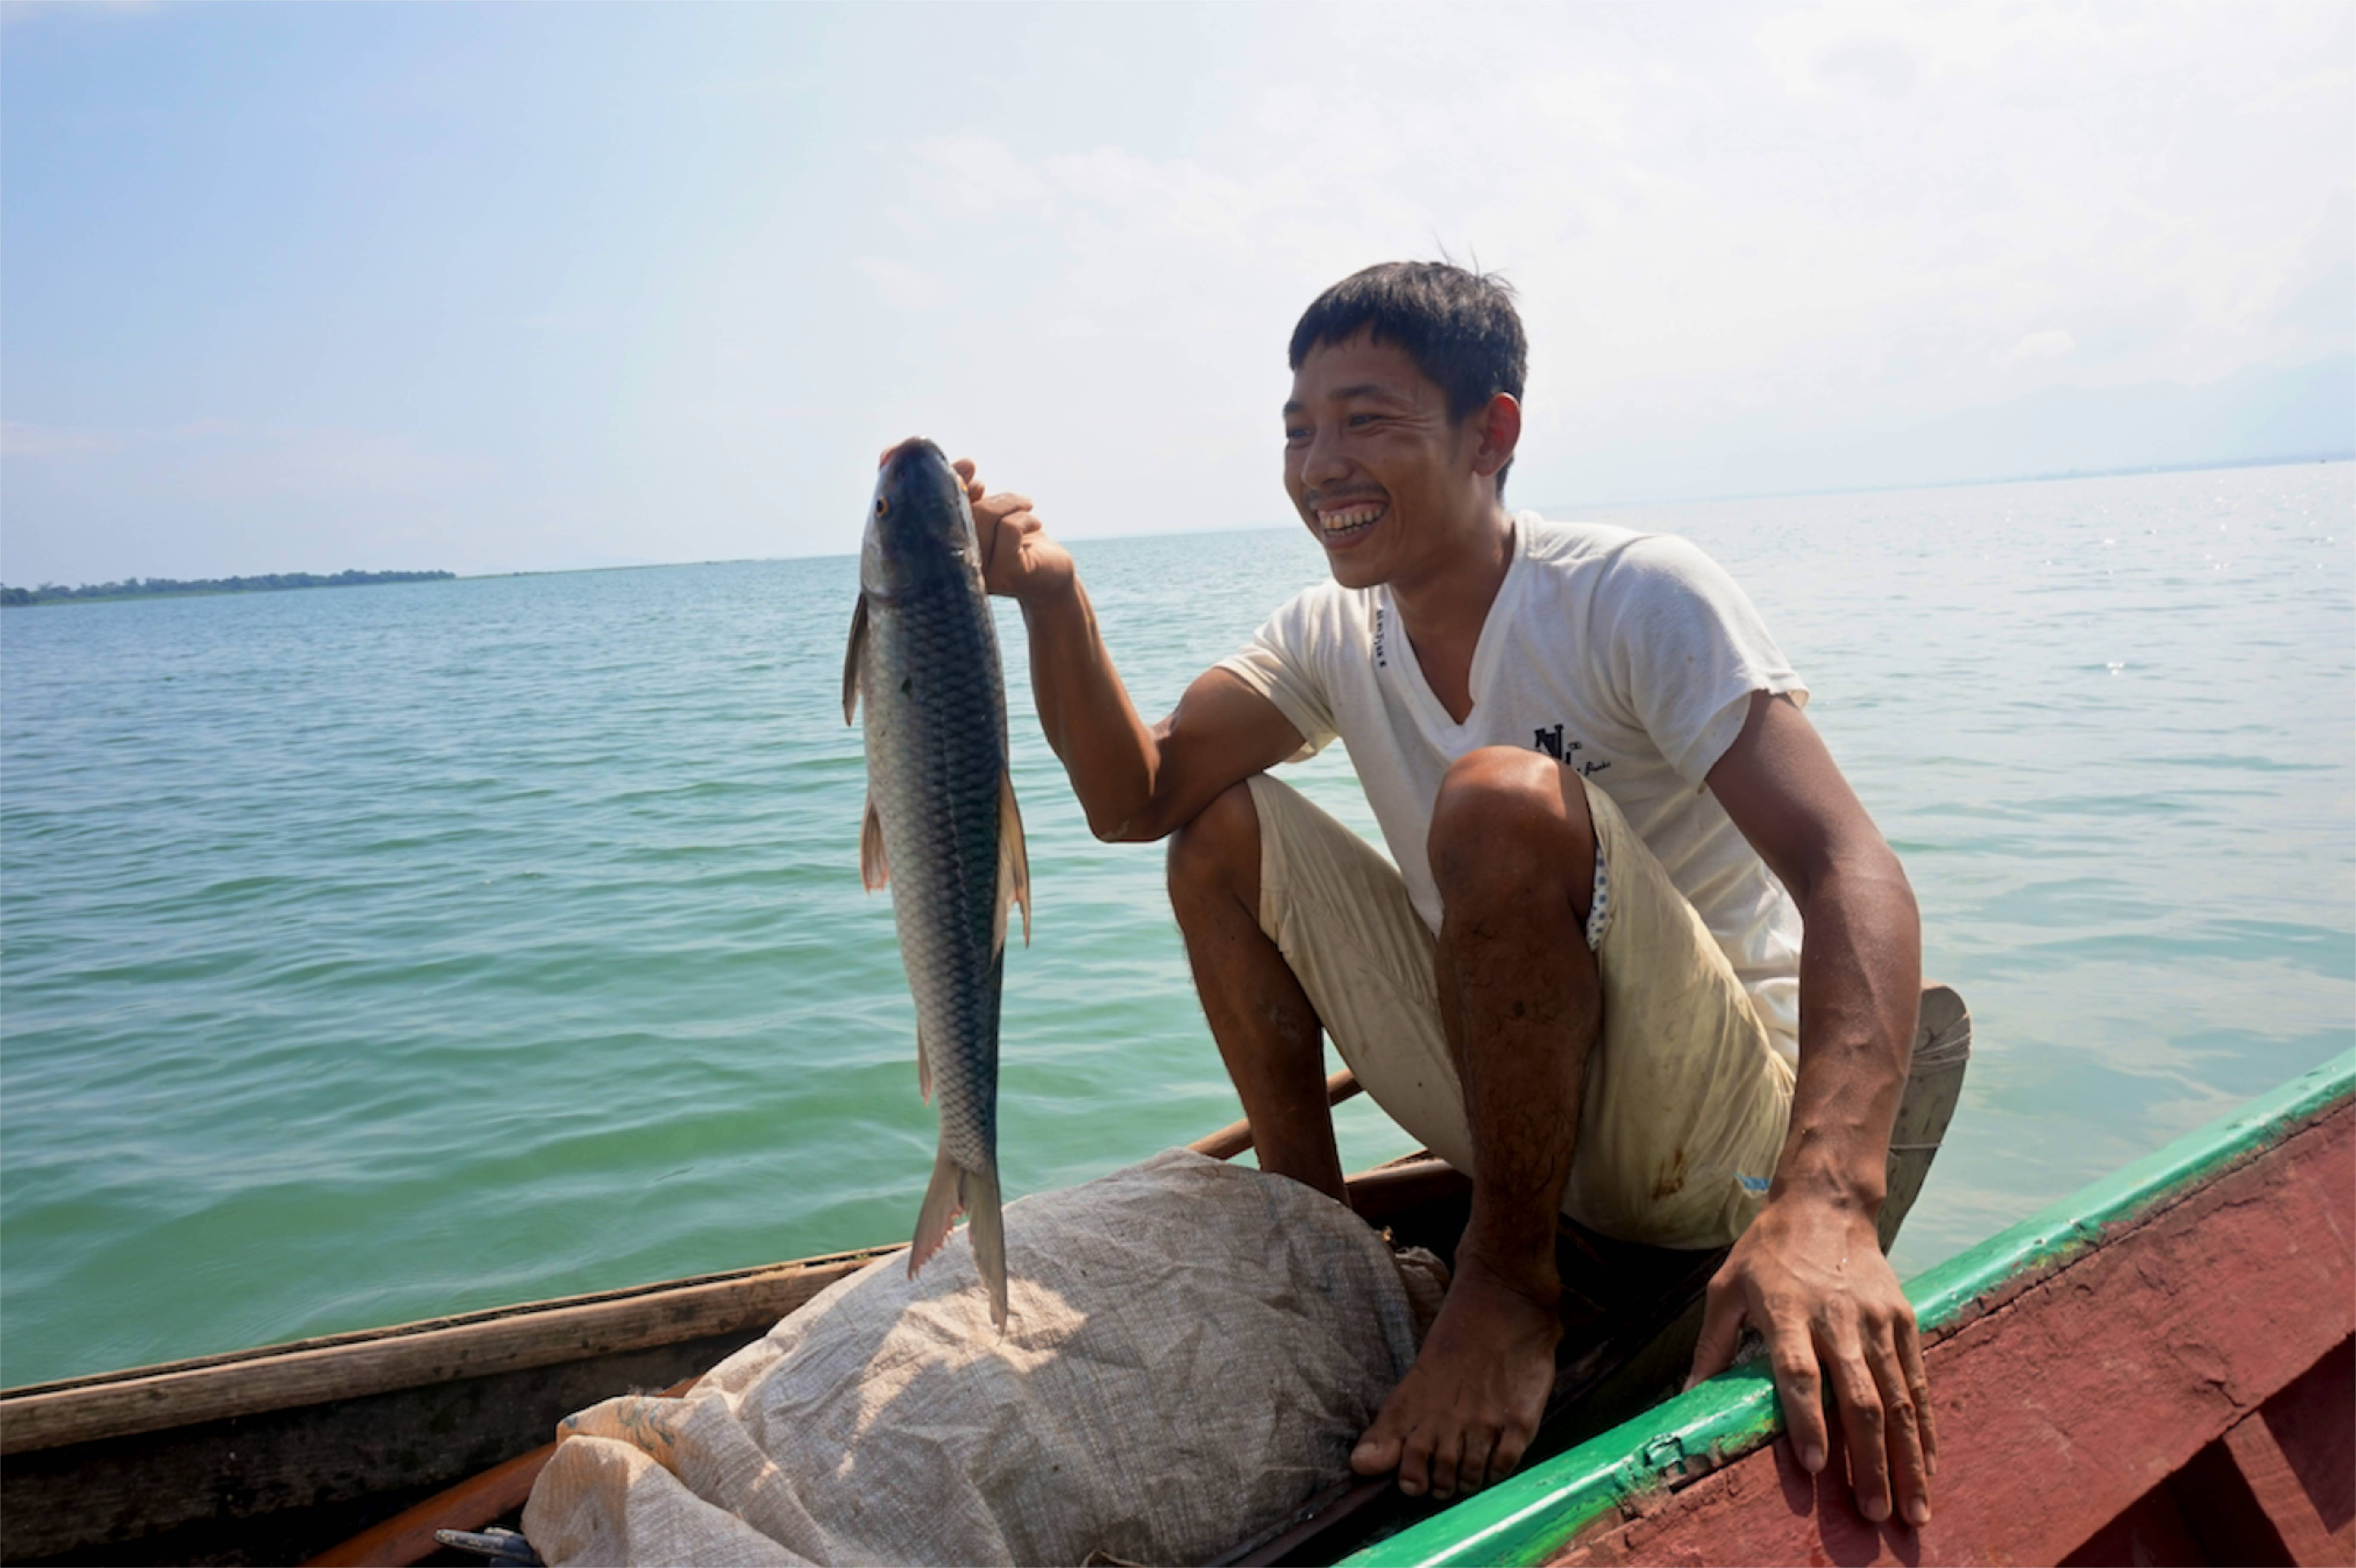 Fisherman with big catch